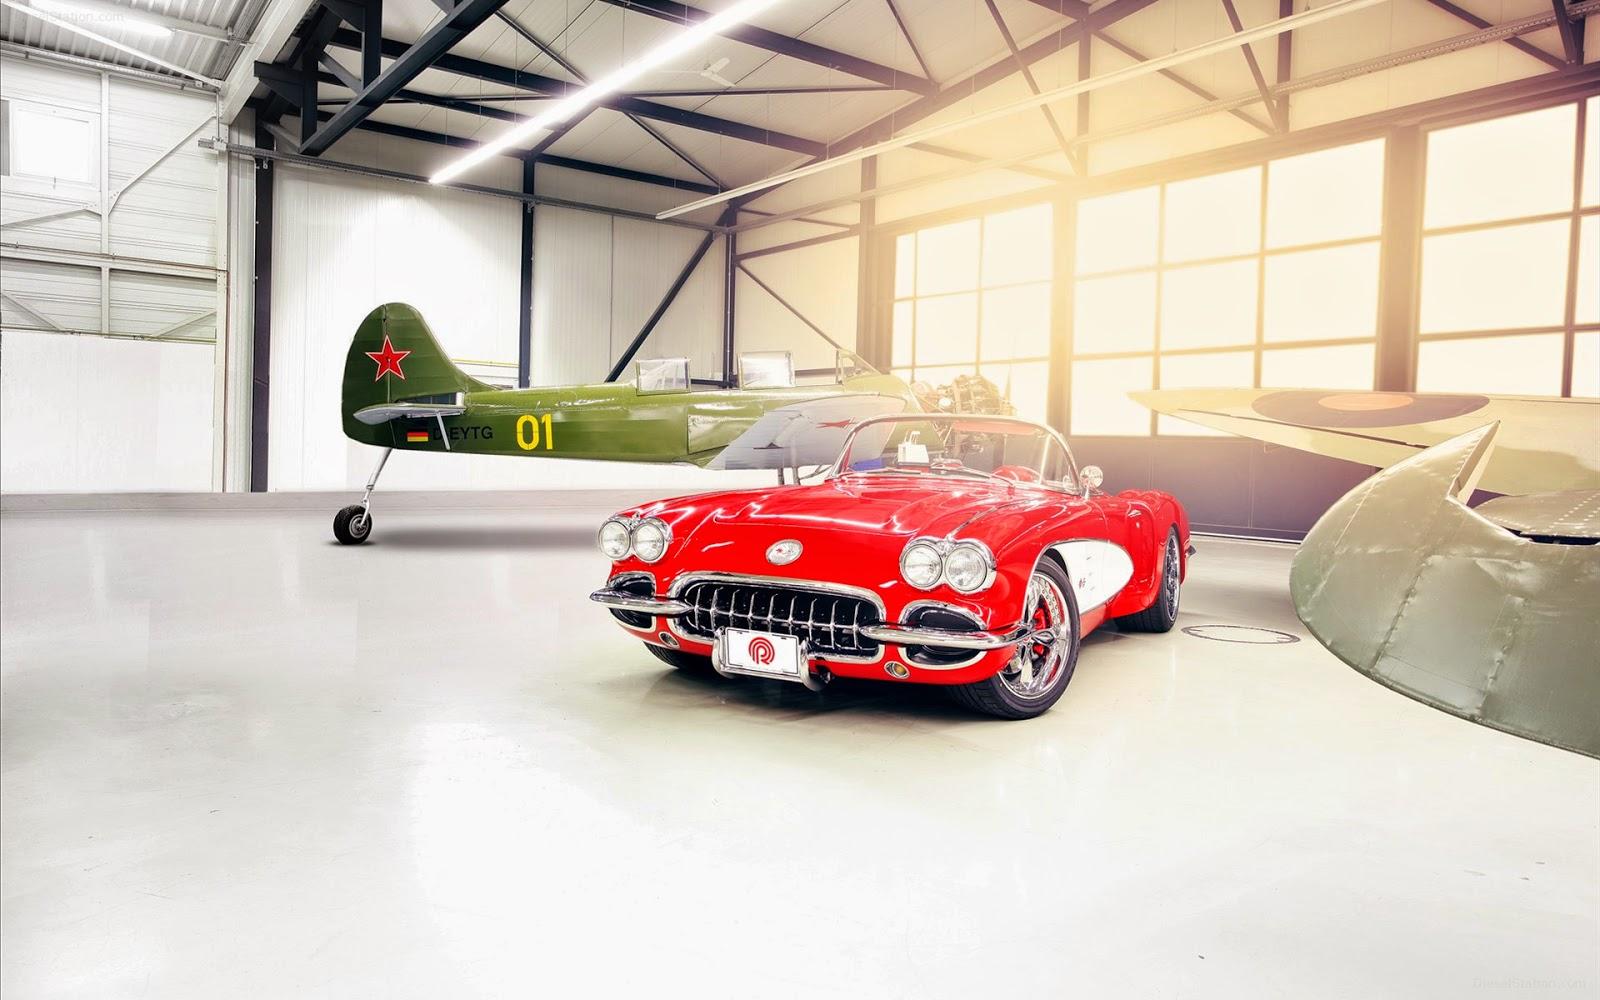 http://www.autocarsinfo.com/2014/10/chevrolet-corvette-1959-pogea-racing.html